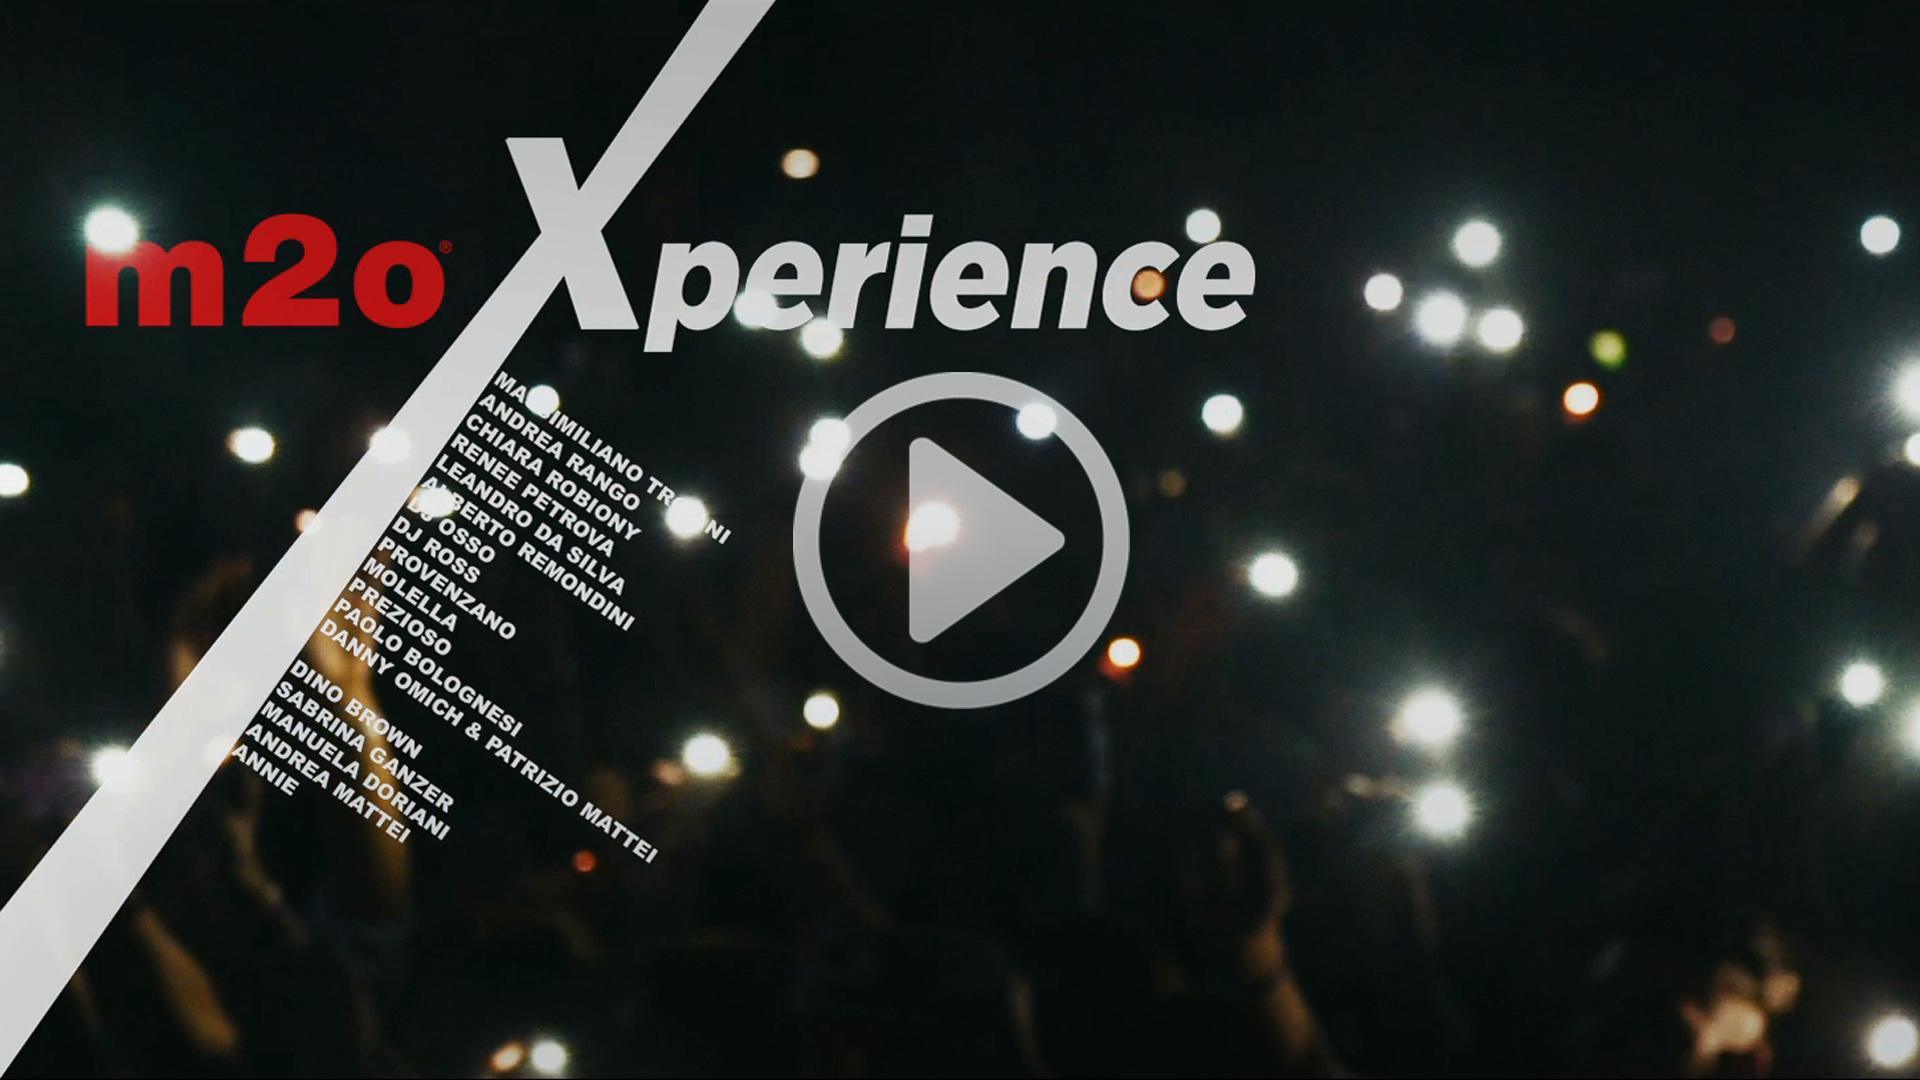 m2o Xperience 2015